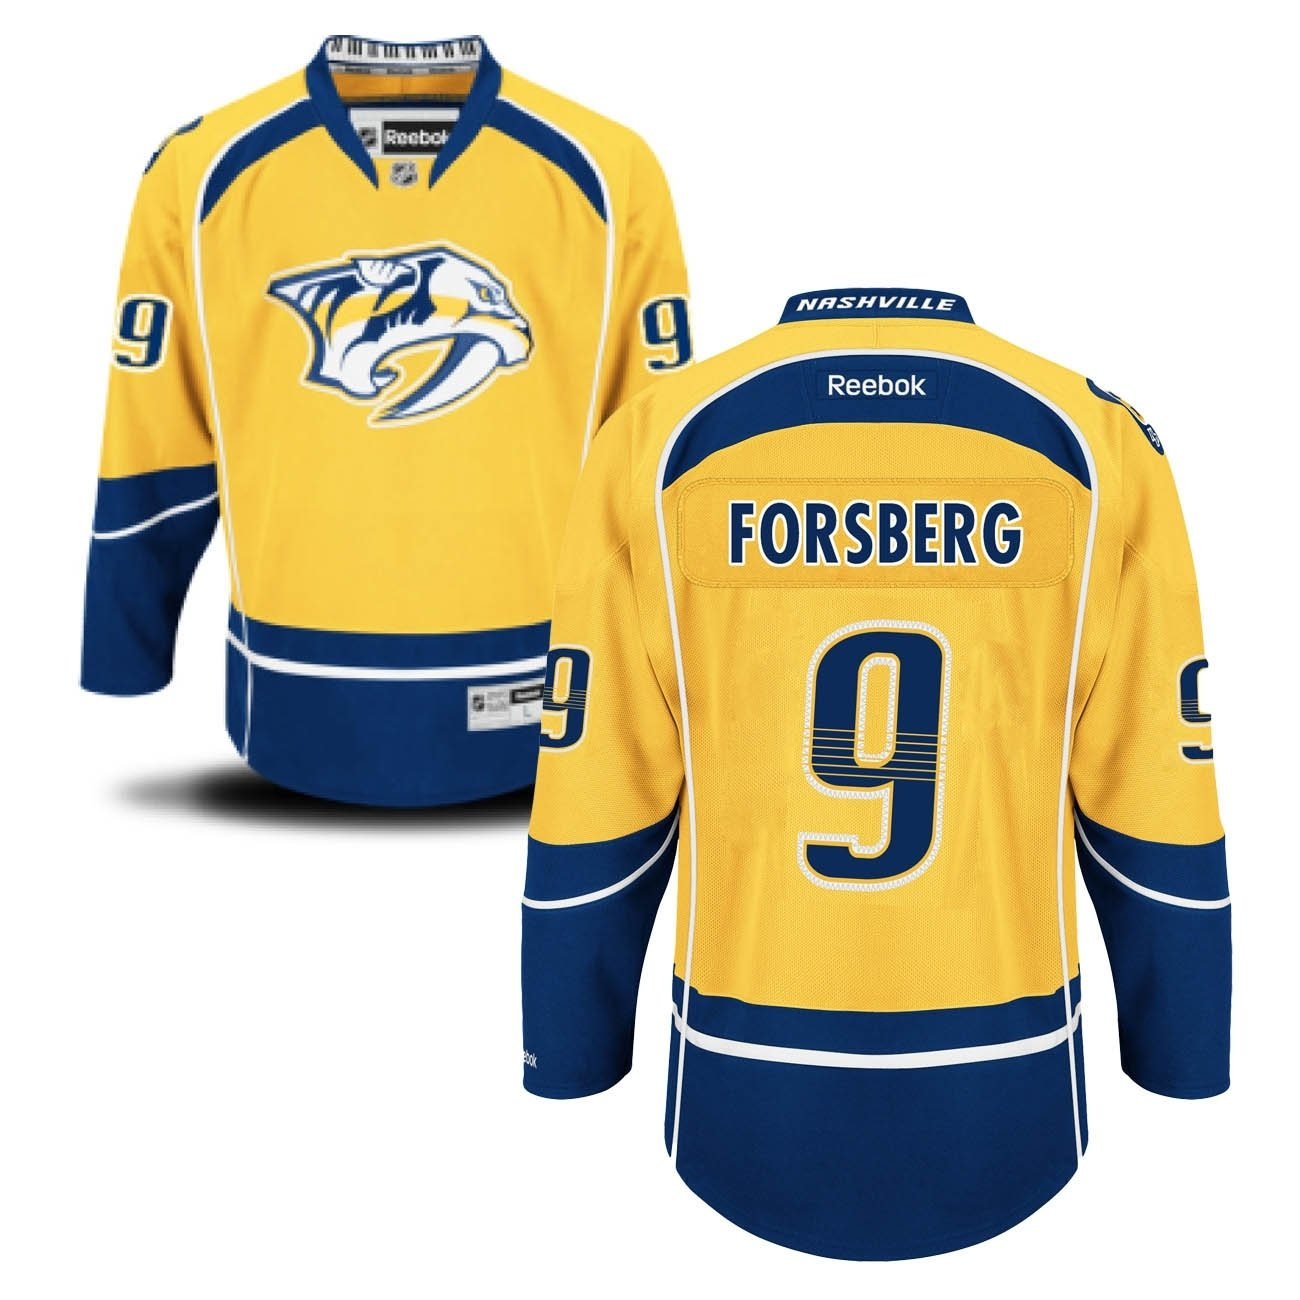 on sale aaa96 ca97e Reebok Nashville Predators Filip Forsberg #9 NHL Jersey Home ...